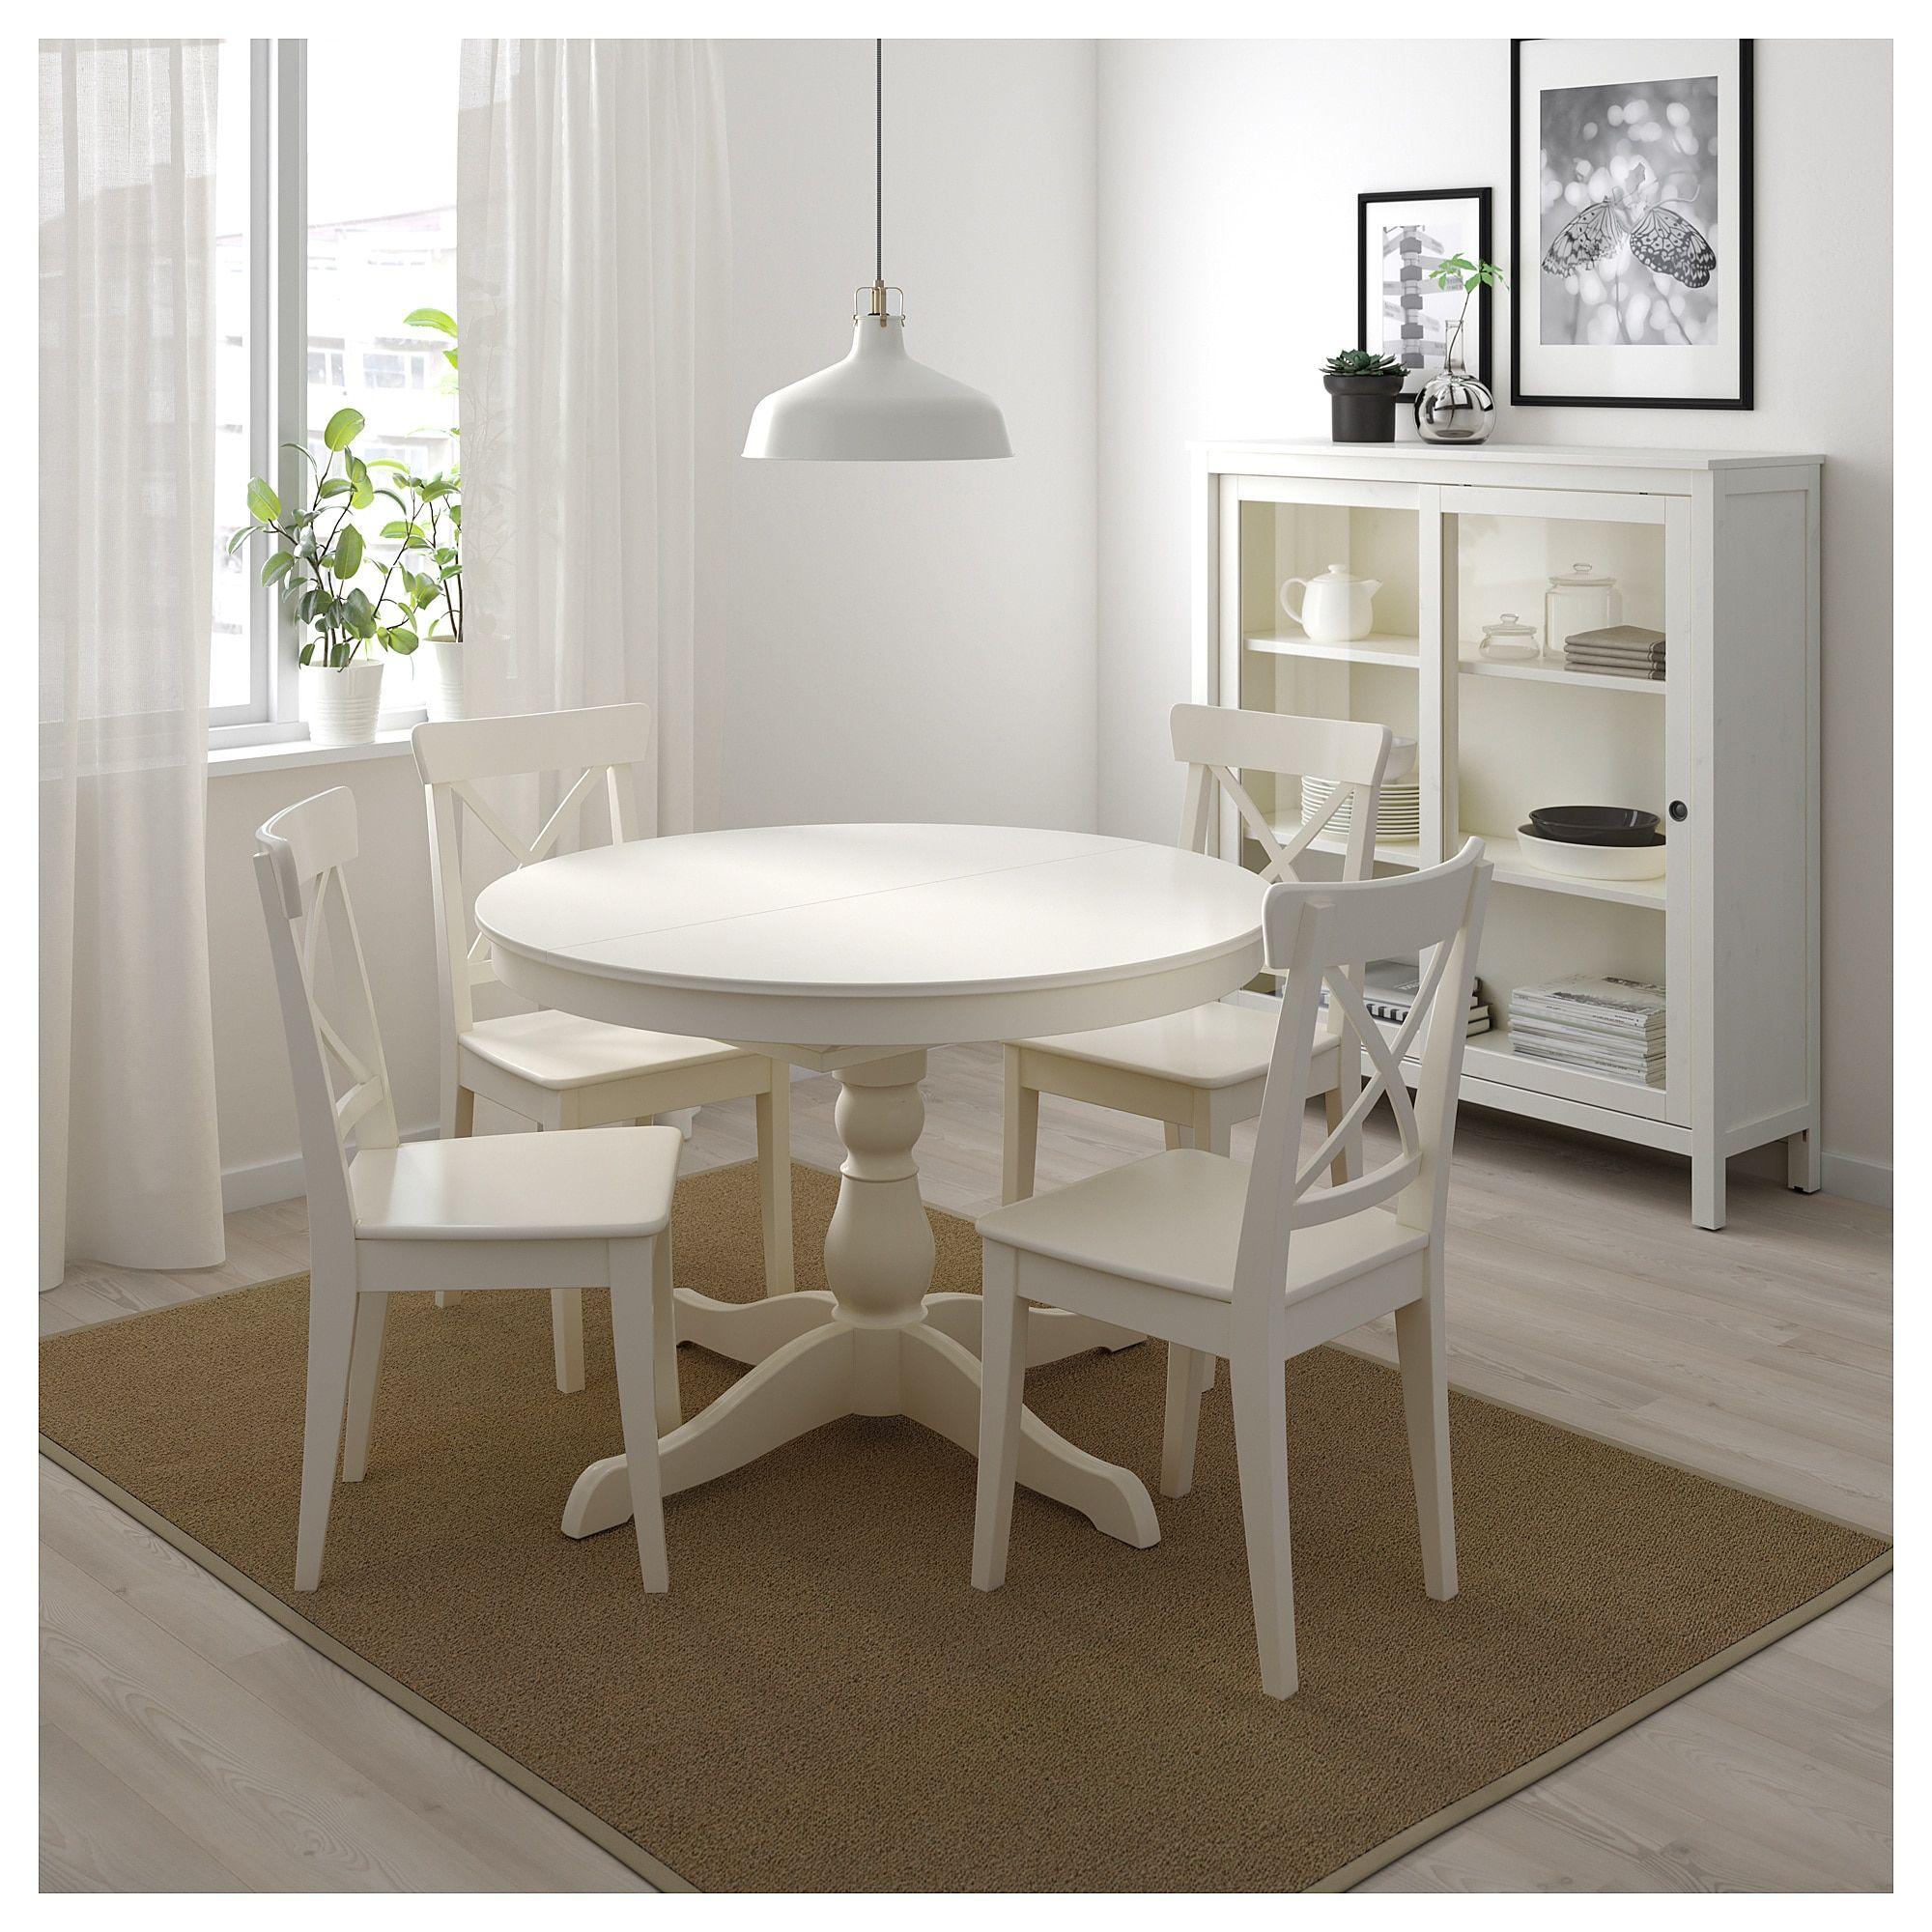 Ingatorp Extendable Table White 43 1 4 61 Malenkie Kuhonnye